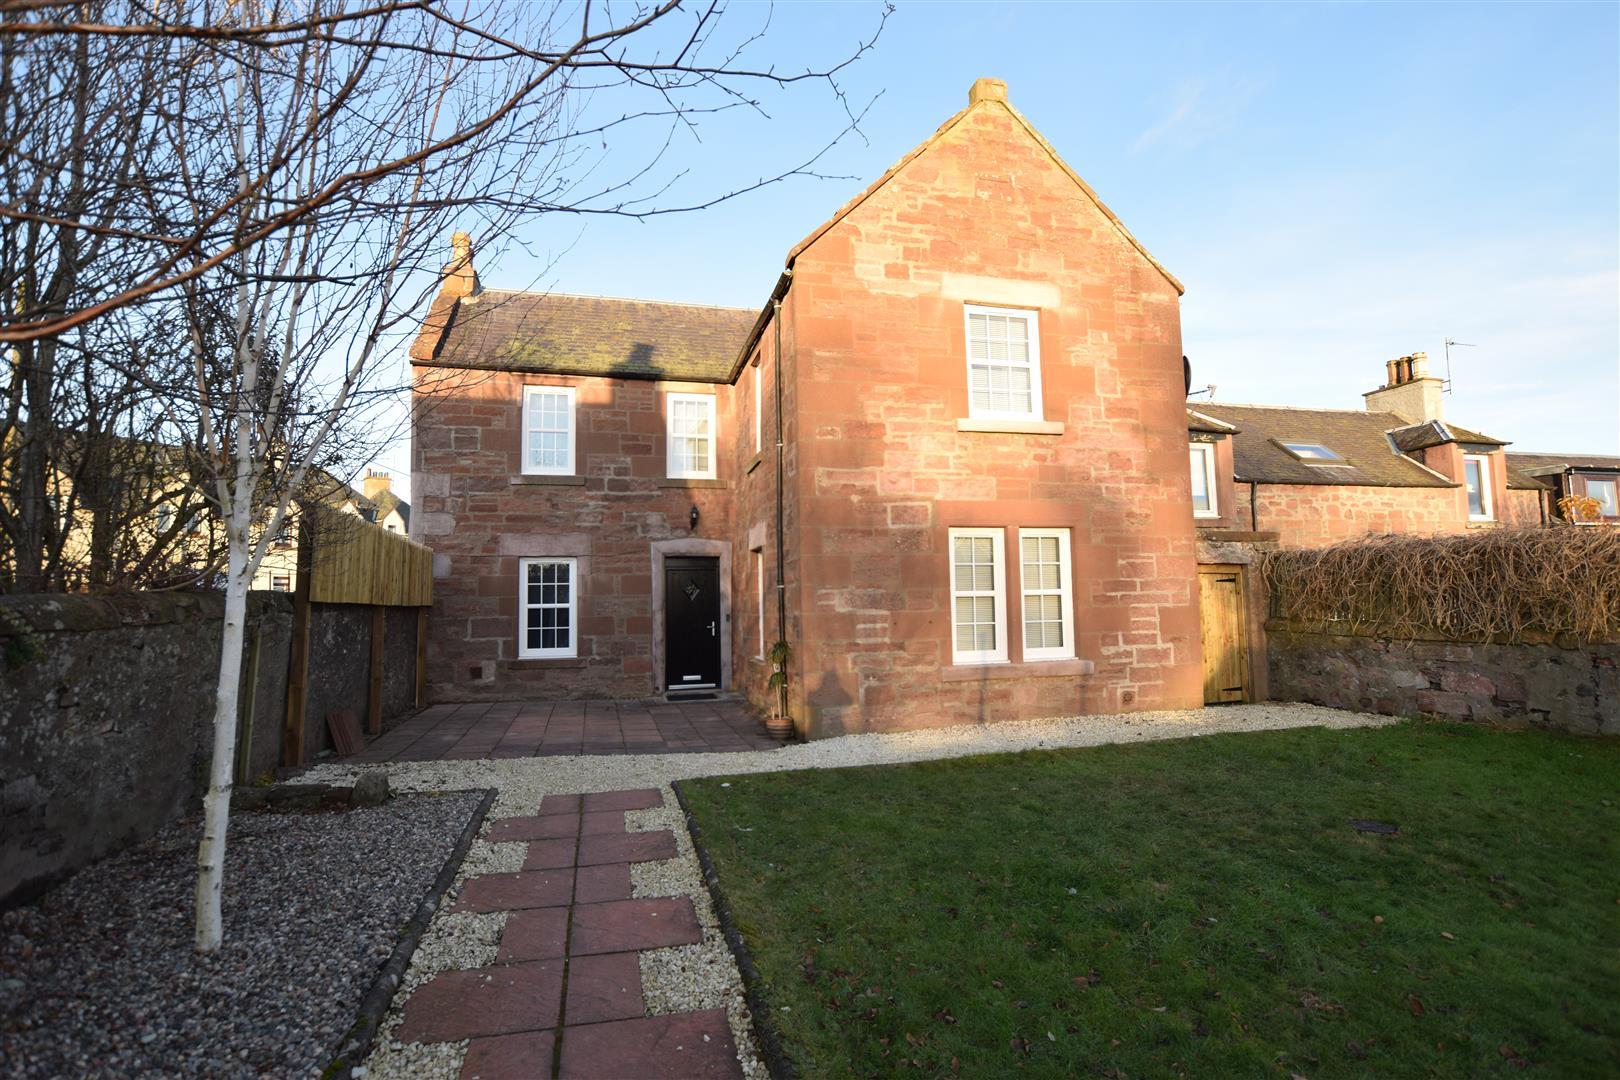 Springbank House, Springbank, Alyth, Blairgowrie, Perthshire, PH11 8BH, UK